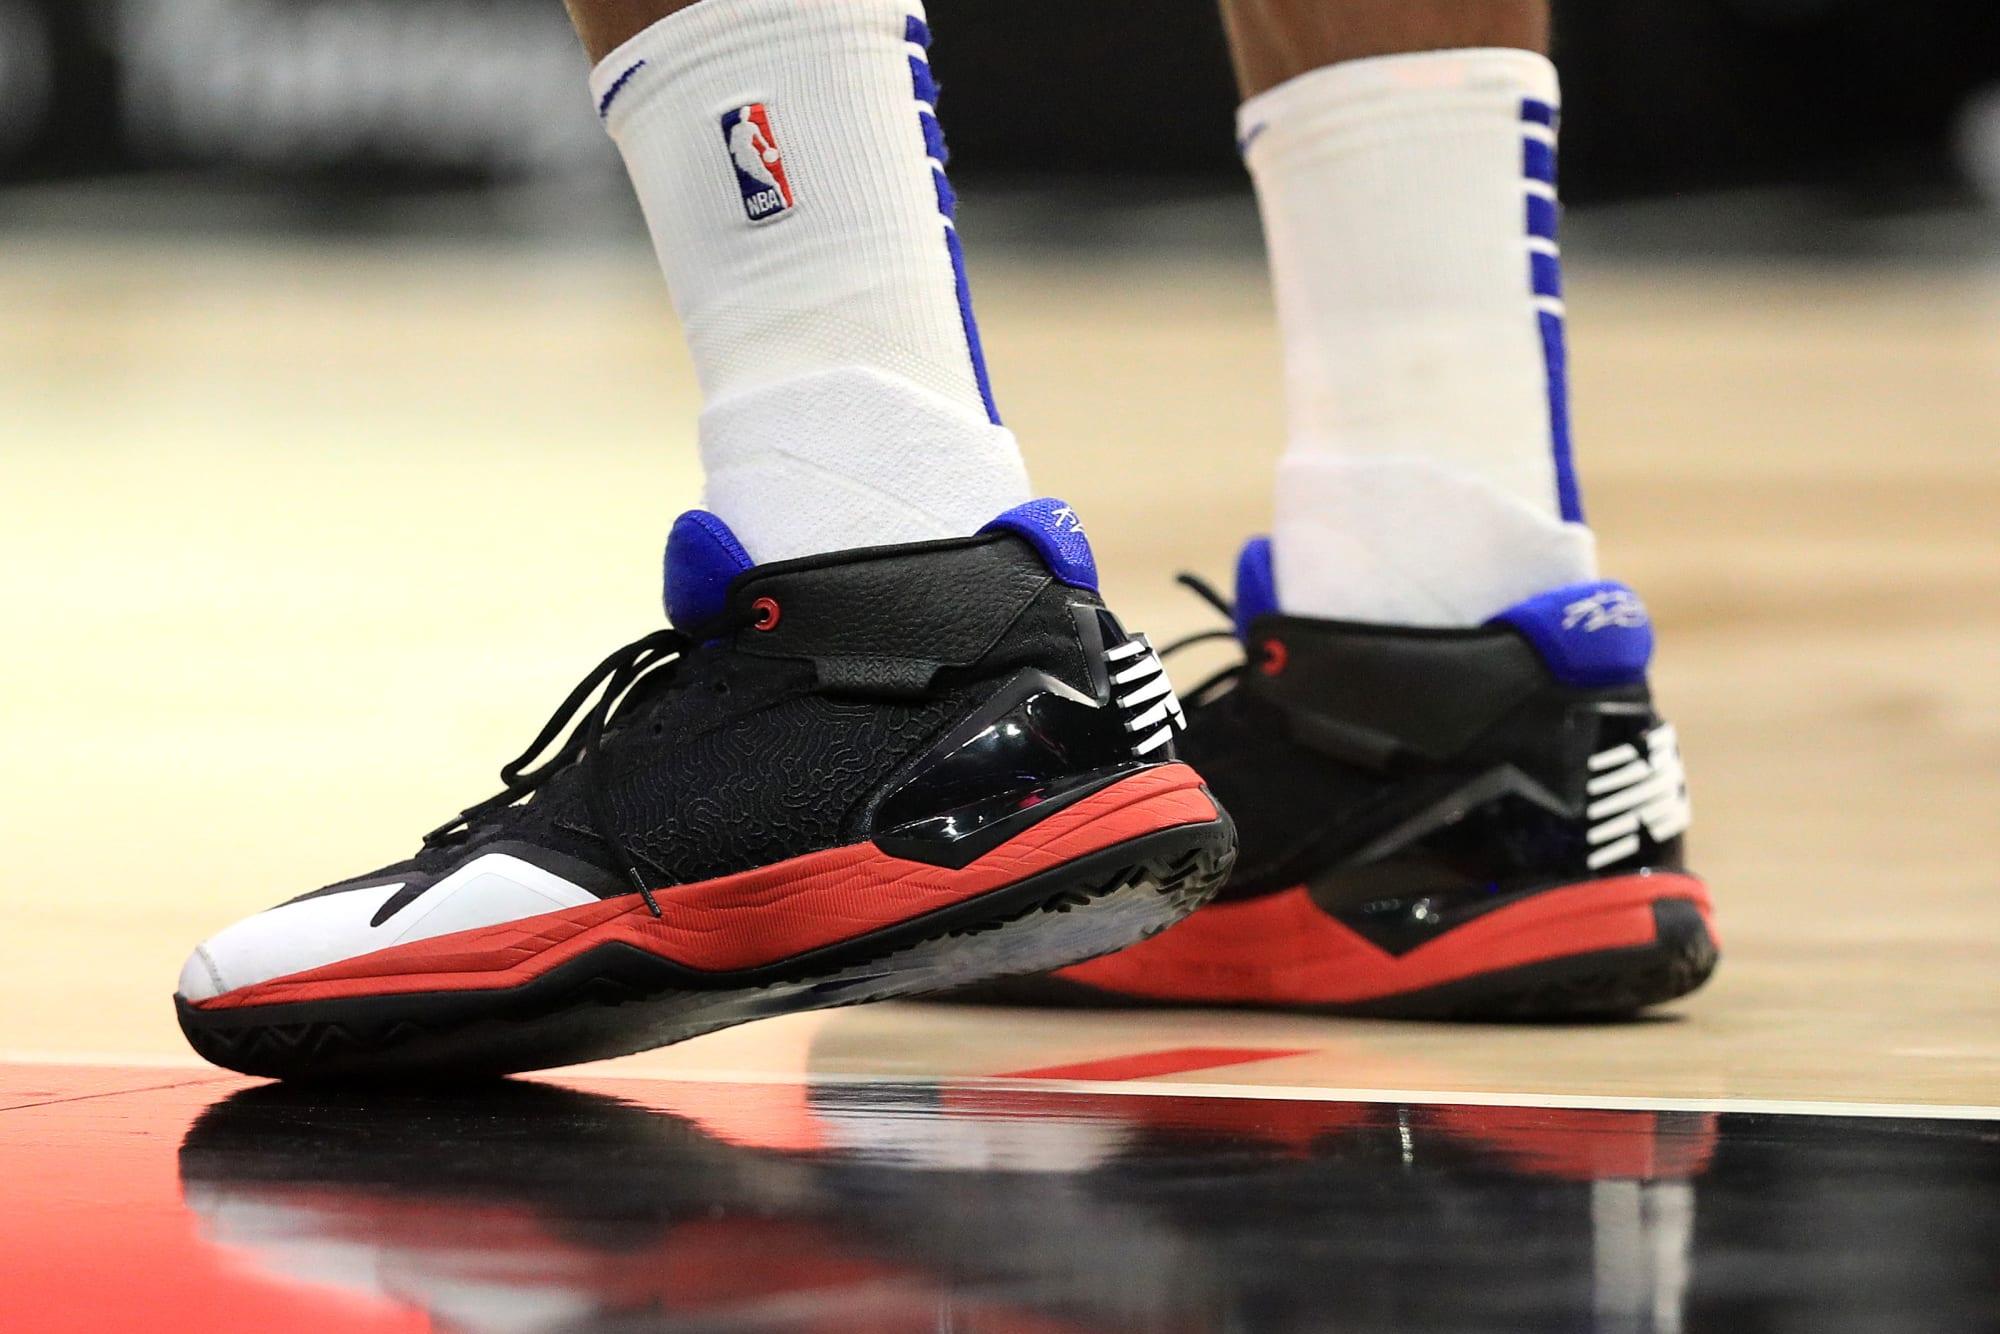 Clippers' Kawhi Leonard's sneaker brand